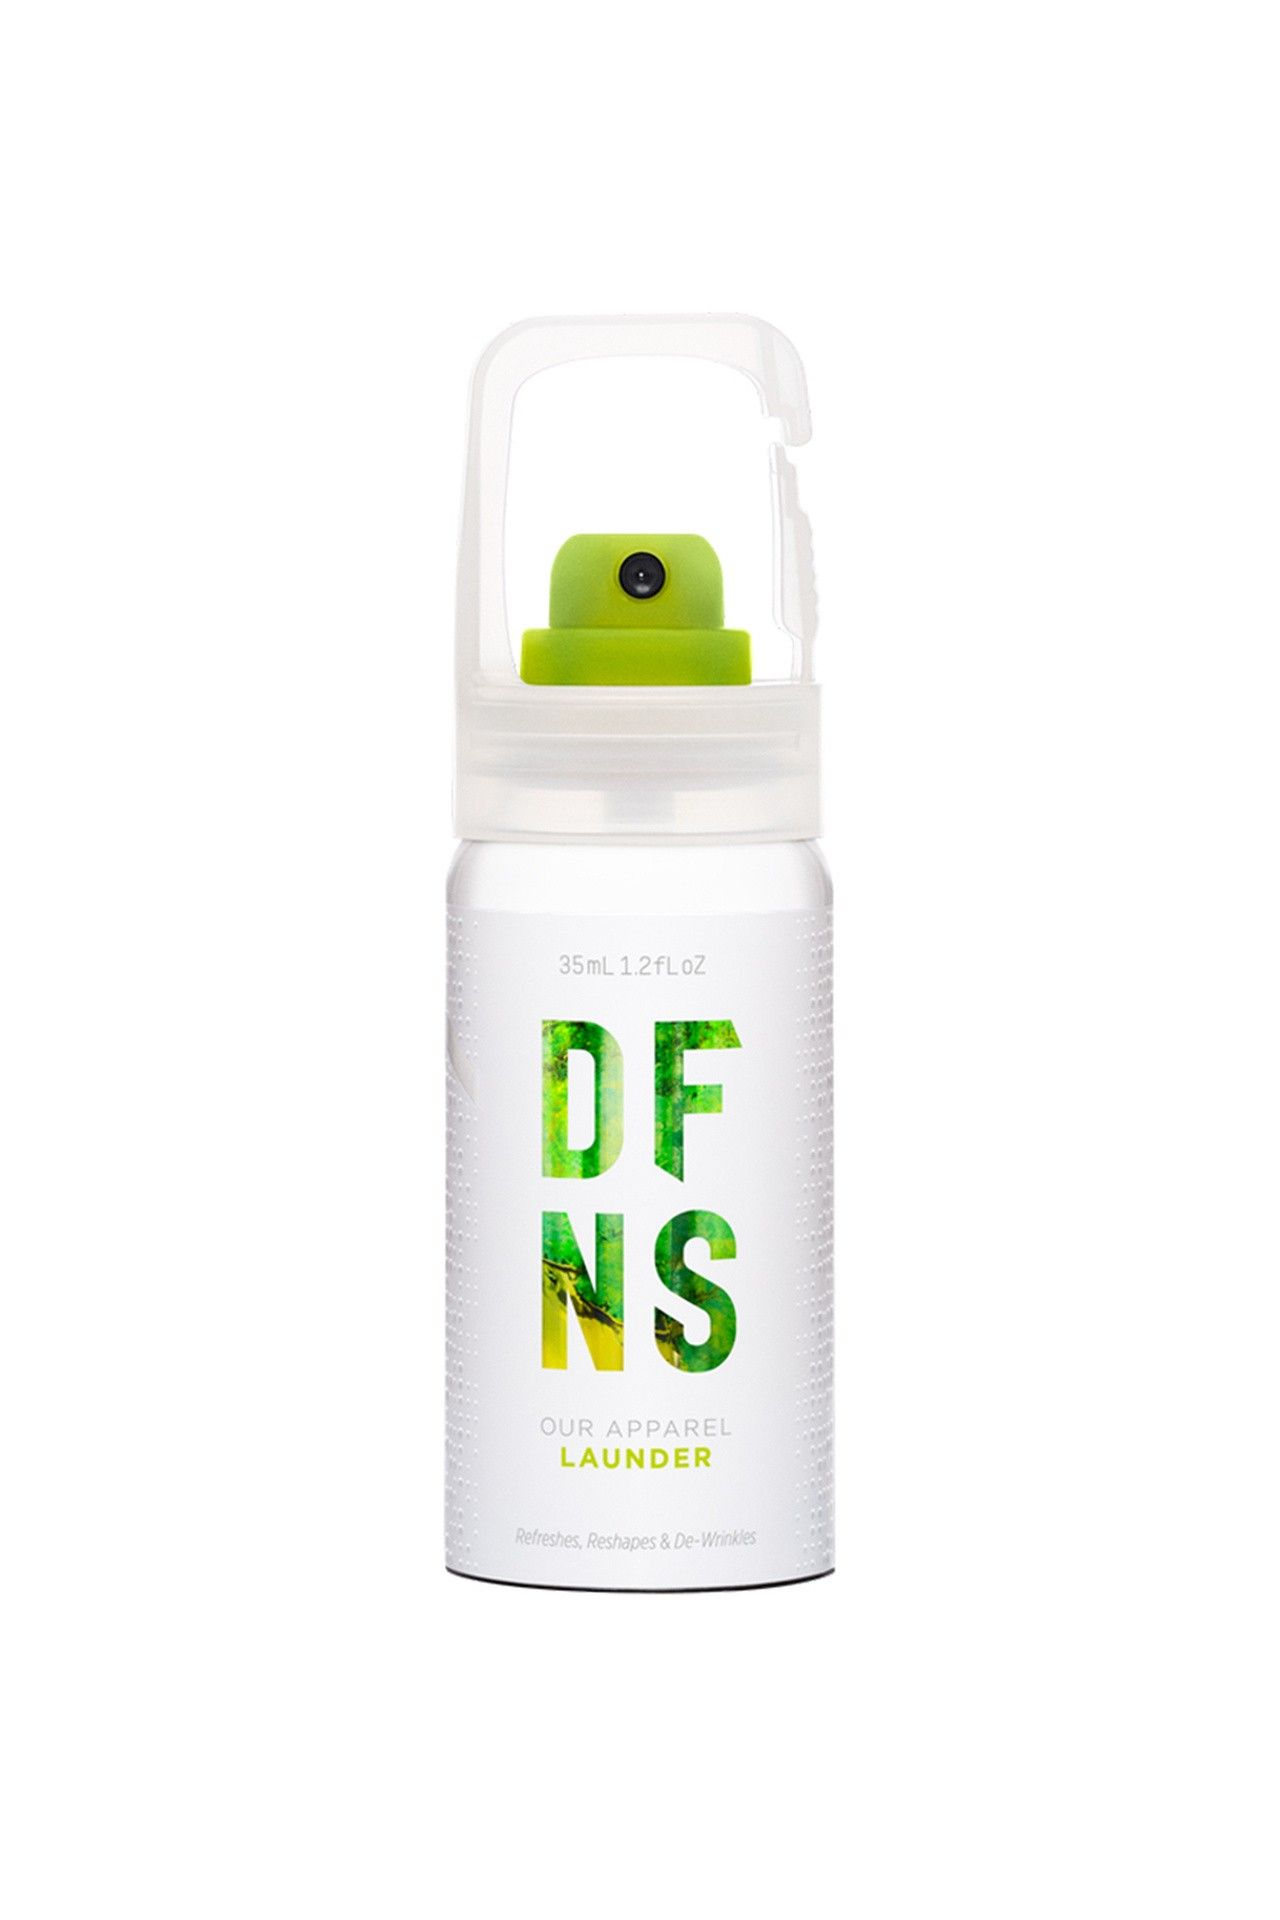 Afbeelding van DFNS Onderhoud DFNS Apparel Launder - Mini, 35 ml x 2190801